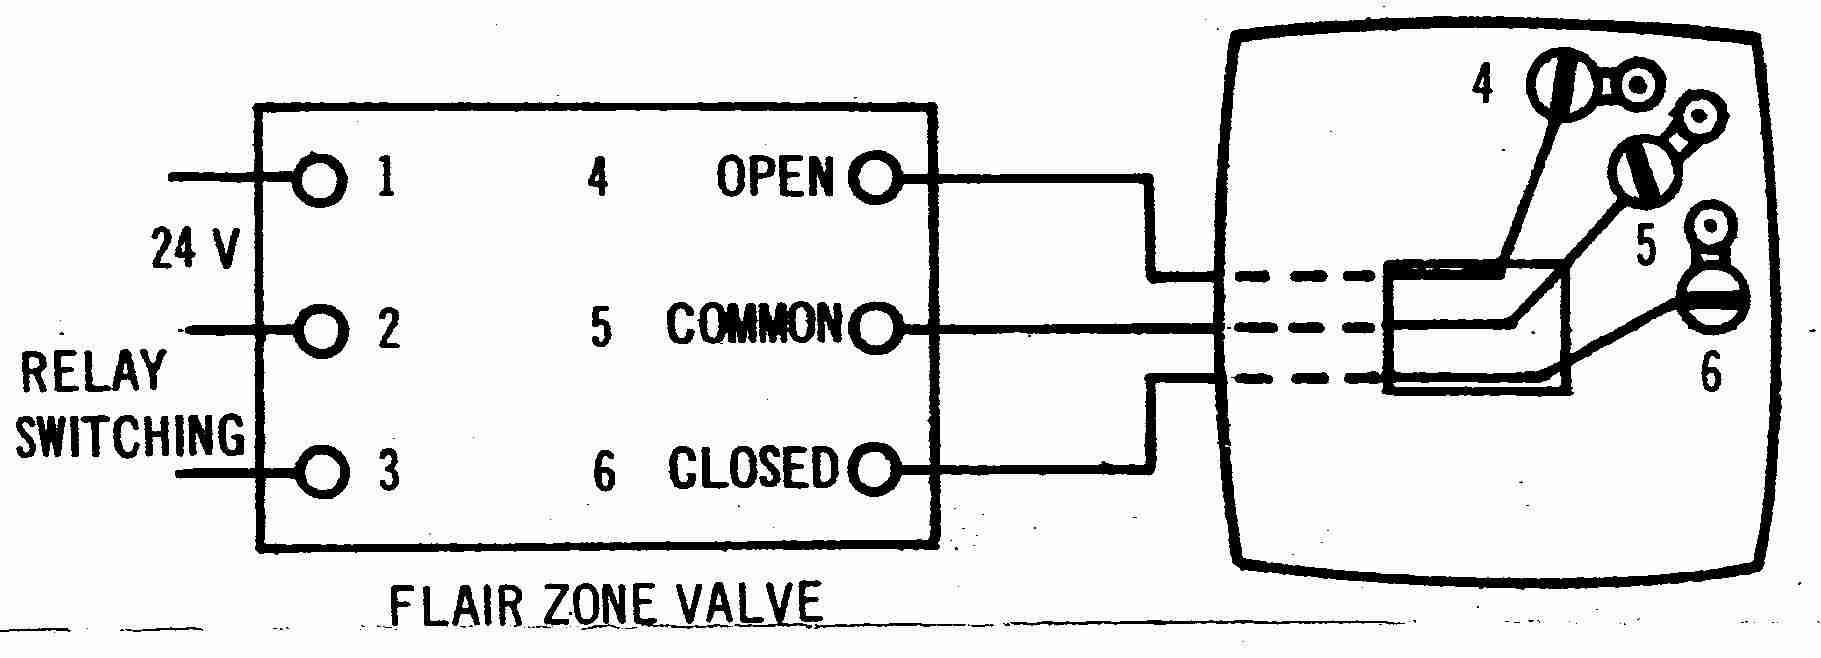 Diagram Wiring Diagram Zone Valve Thermostat Full Version Hd Quality Valve Thermostat Batterydiagramm Sms3 It